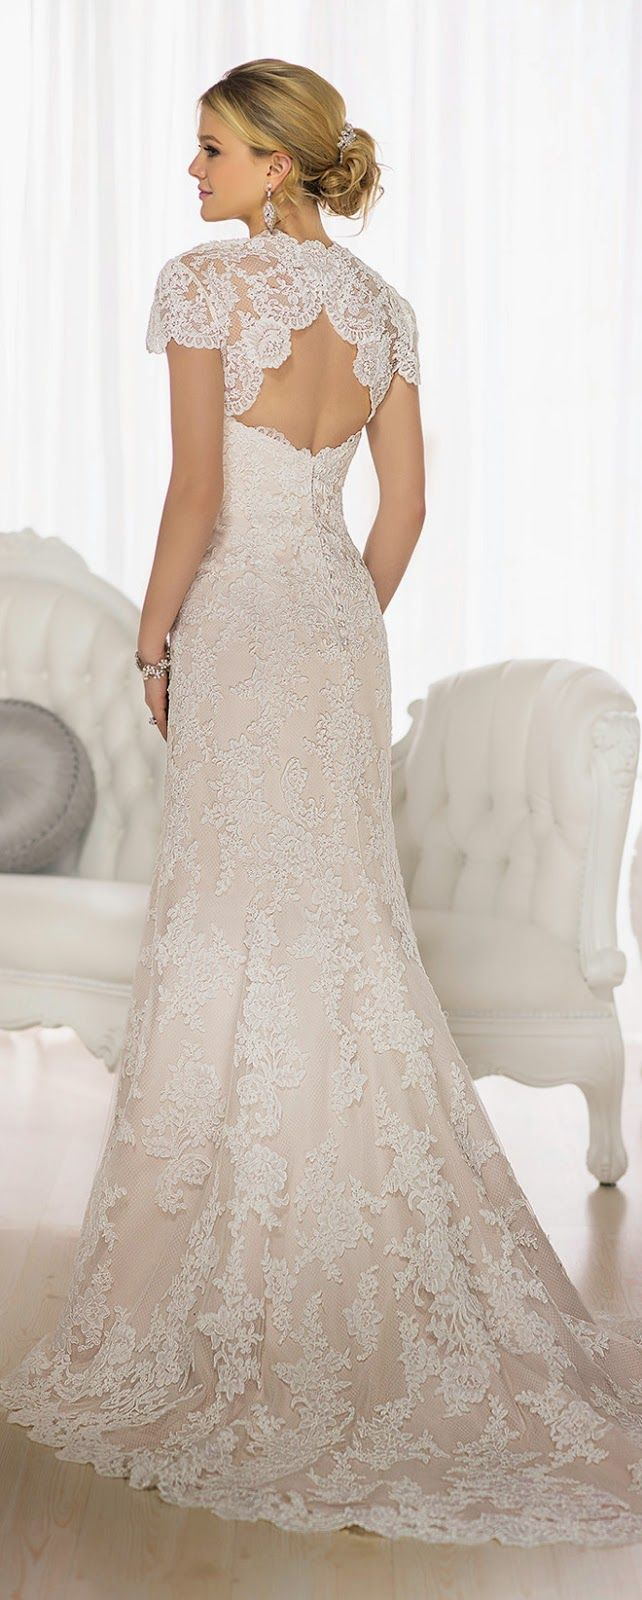 Essense Of Australia Spring 2015 Formal Wedding DressesWedding Dresses SydneyWedding DresssesWedding GownsVintage Style DressesLace